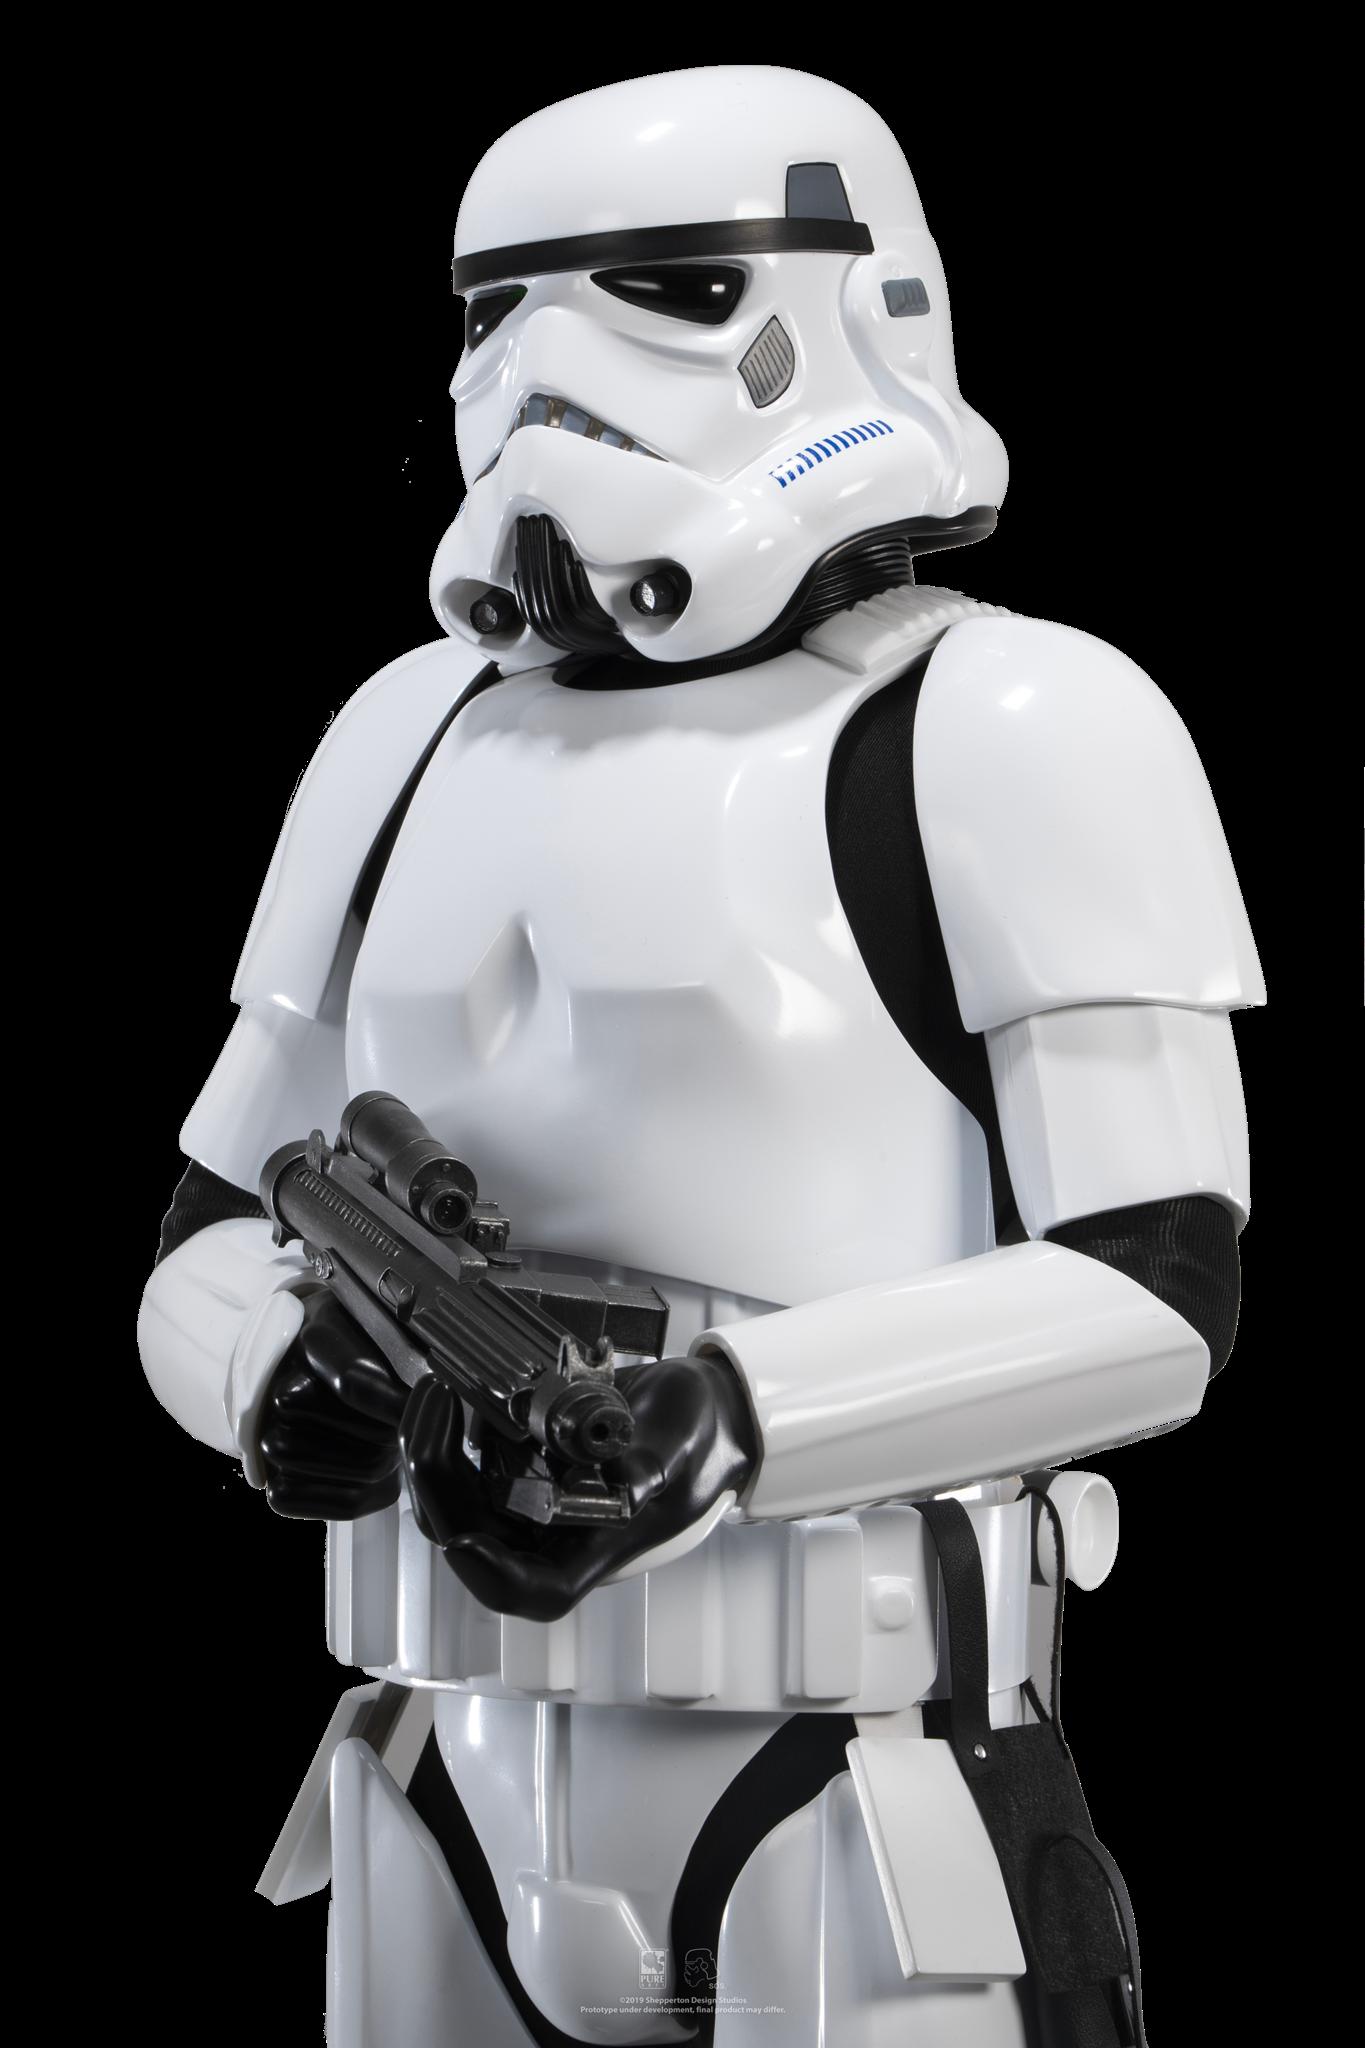 pure-arts-star-wars-original-stormtrooper-1:3-statue-toyslife-09